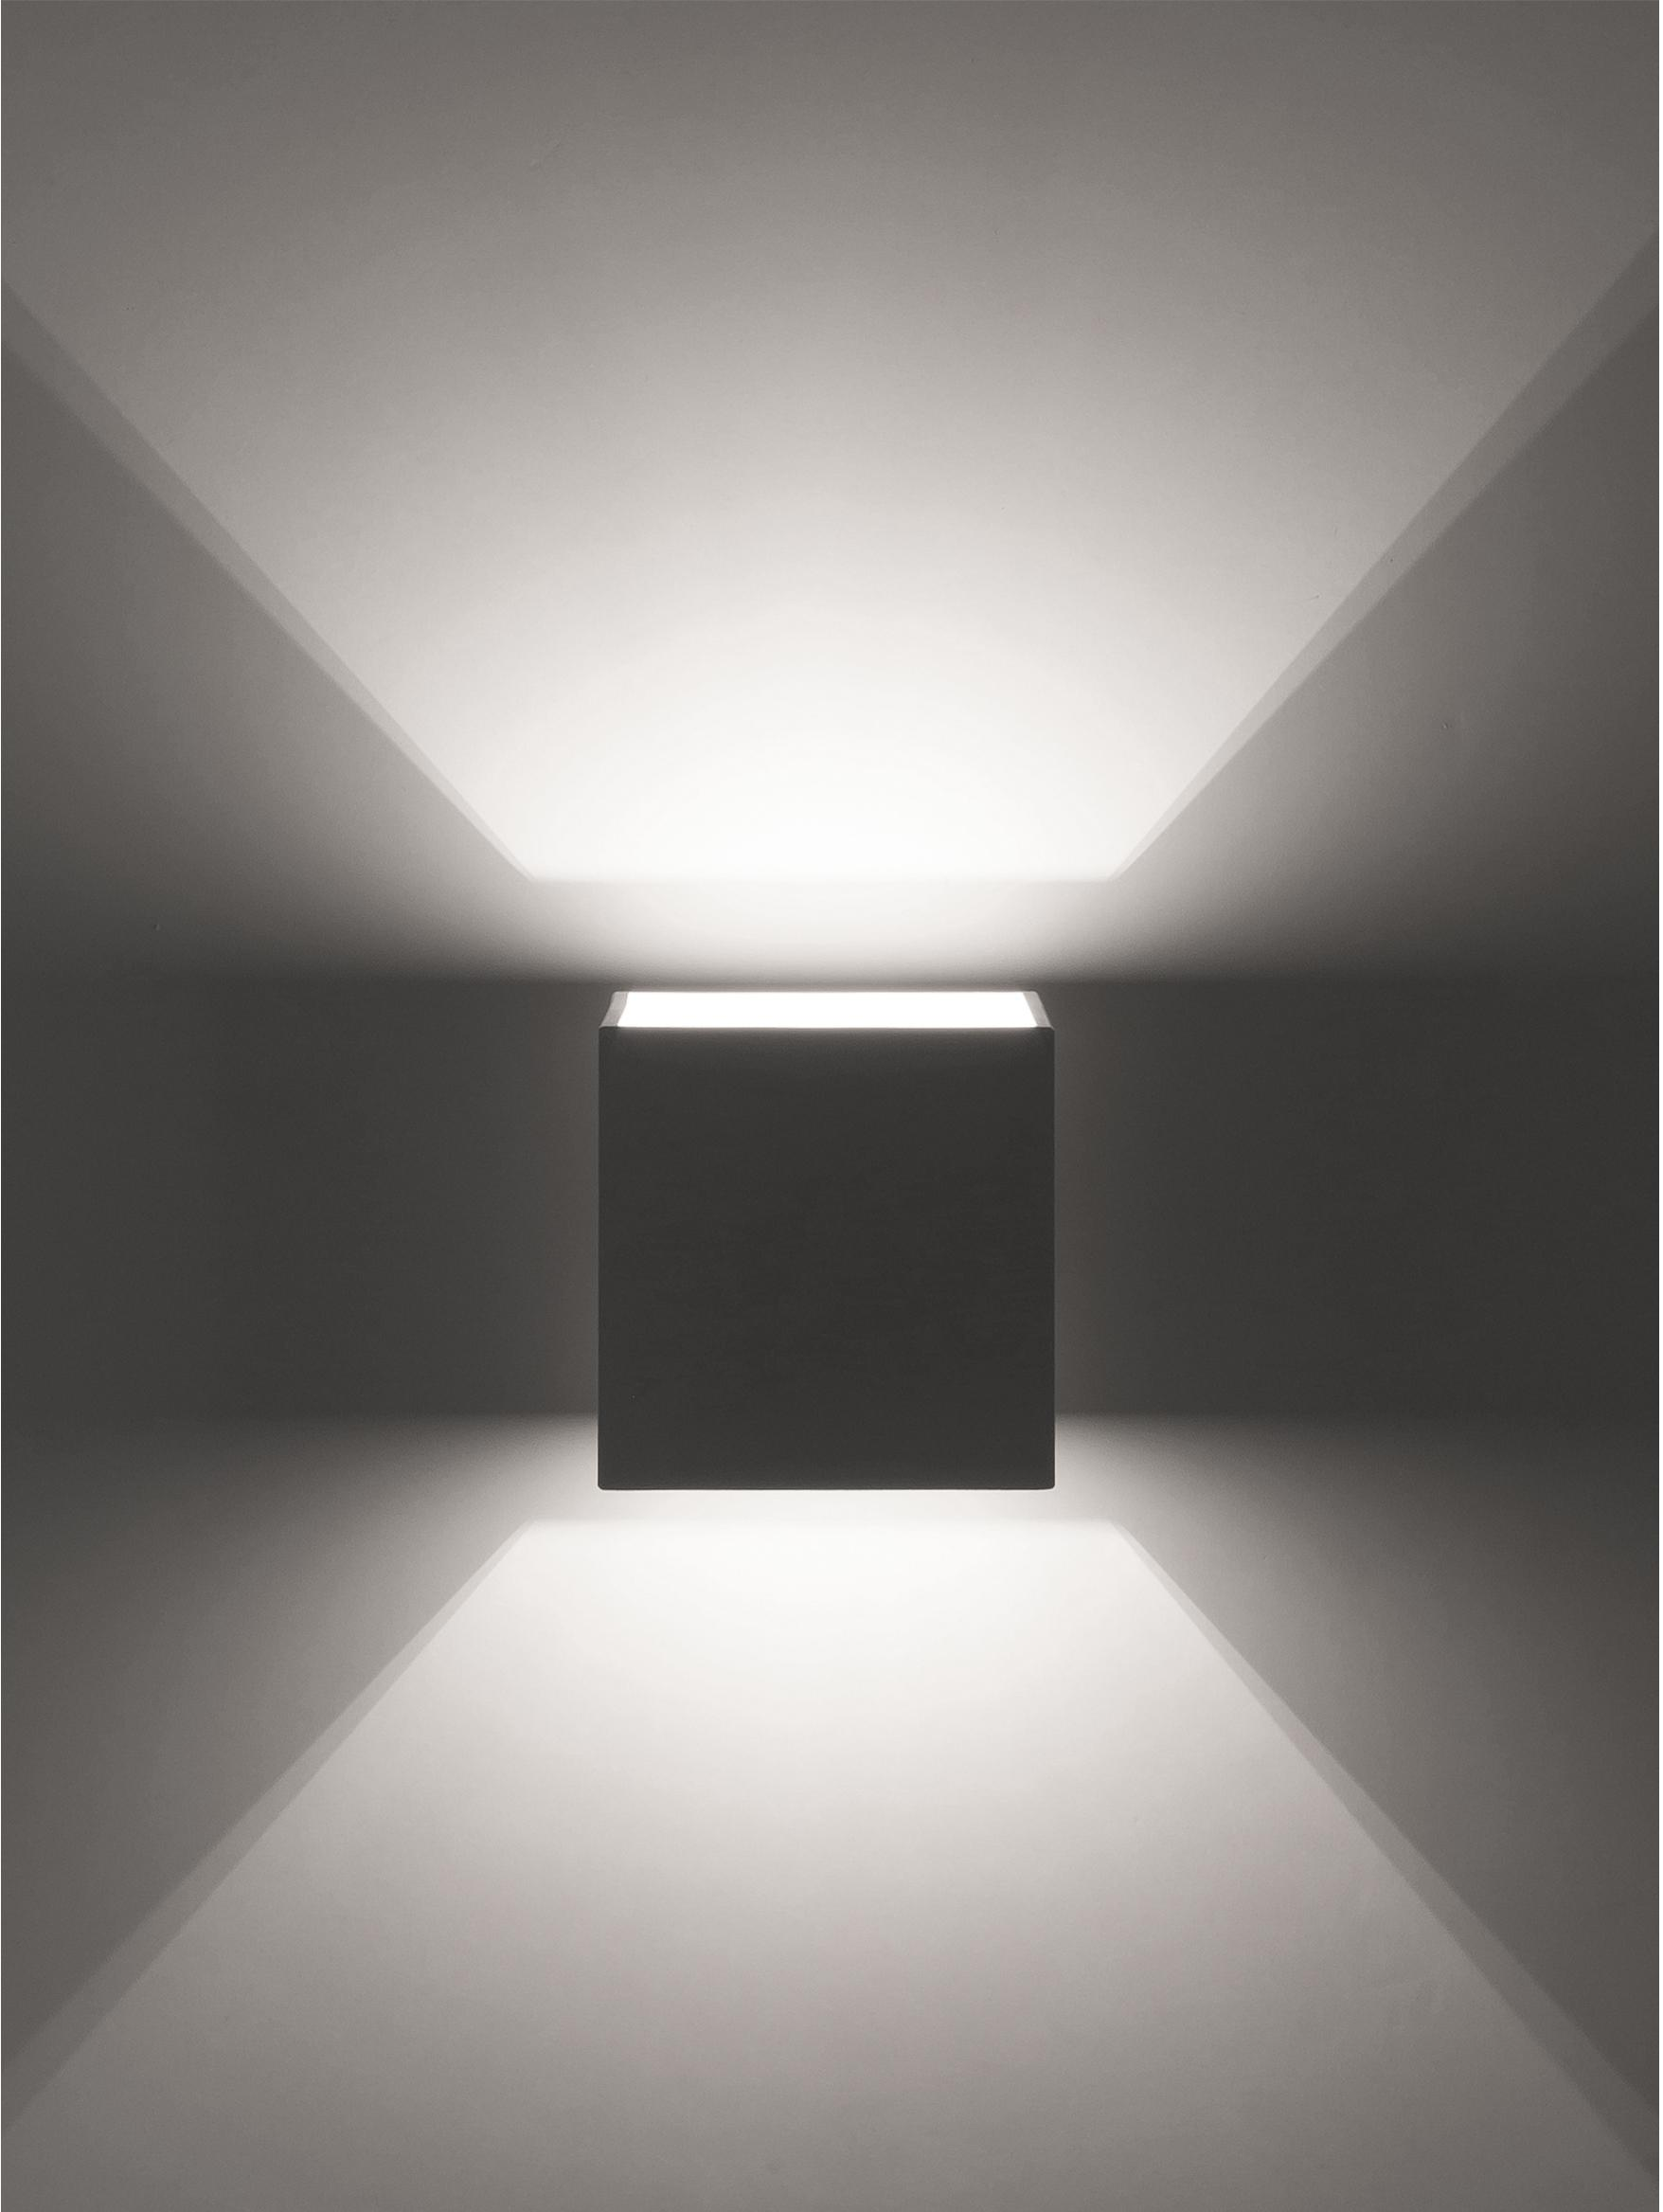 Wandleuchte Quad, Aluminium, pulverbeschichtet, Weiß, 10 x 10 cm